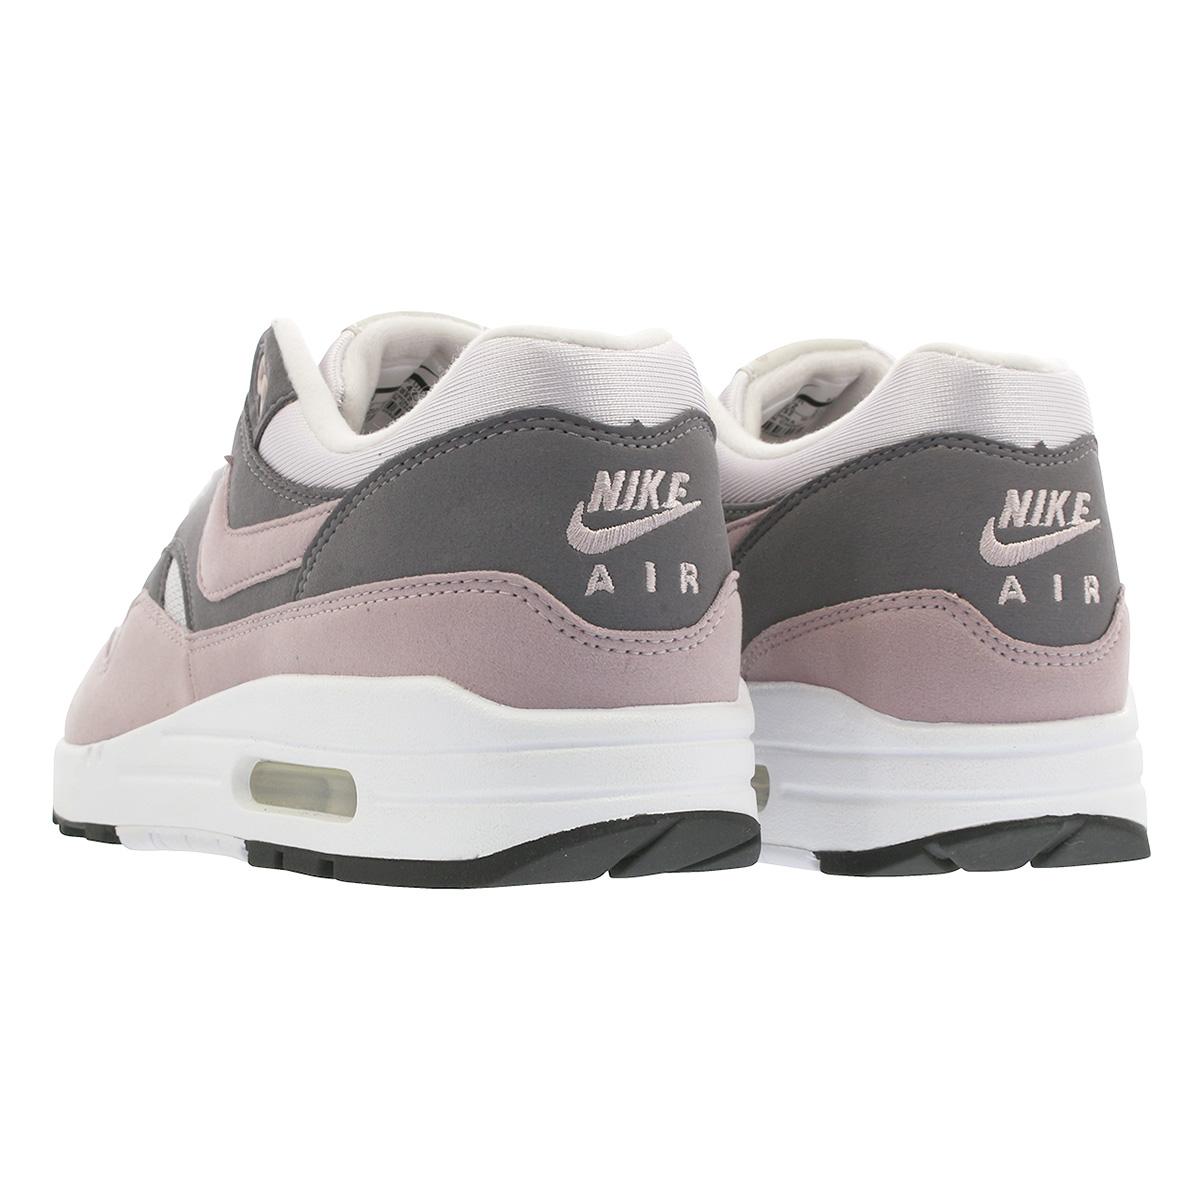 NIKE WMNS AIR MAX 1 Nike women Air Max 1 VAST GREYPARTICLE ROSEGUNSMOKEBLACK 319,986 032